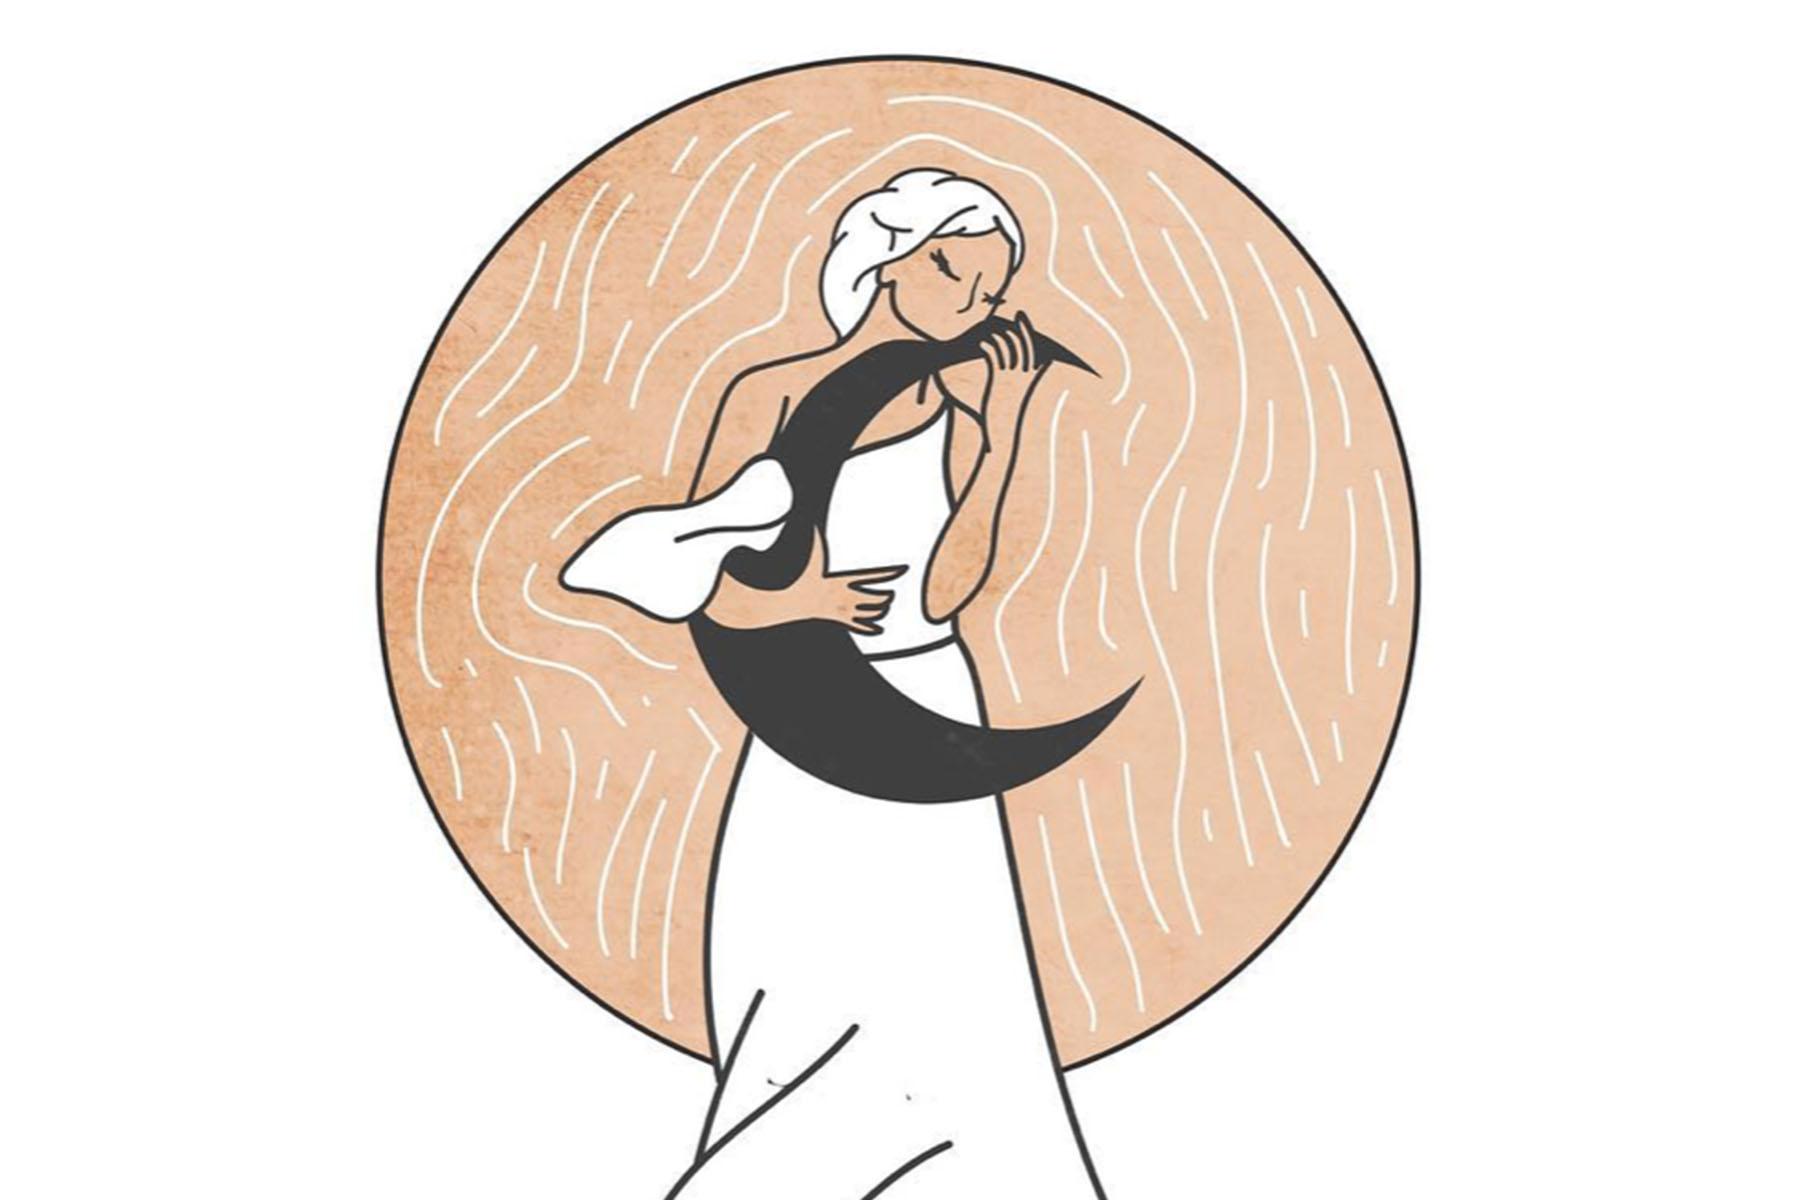 April 2020 Full Moon Libra Horoscopes